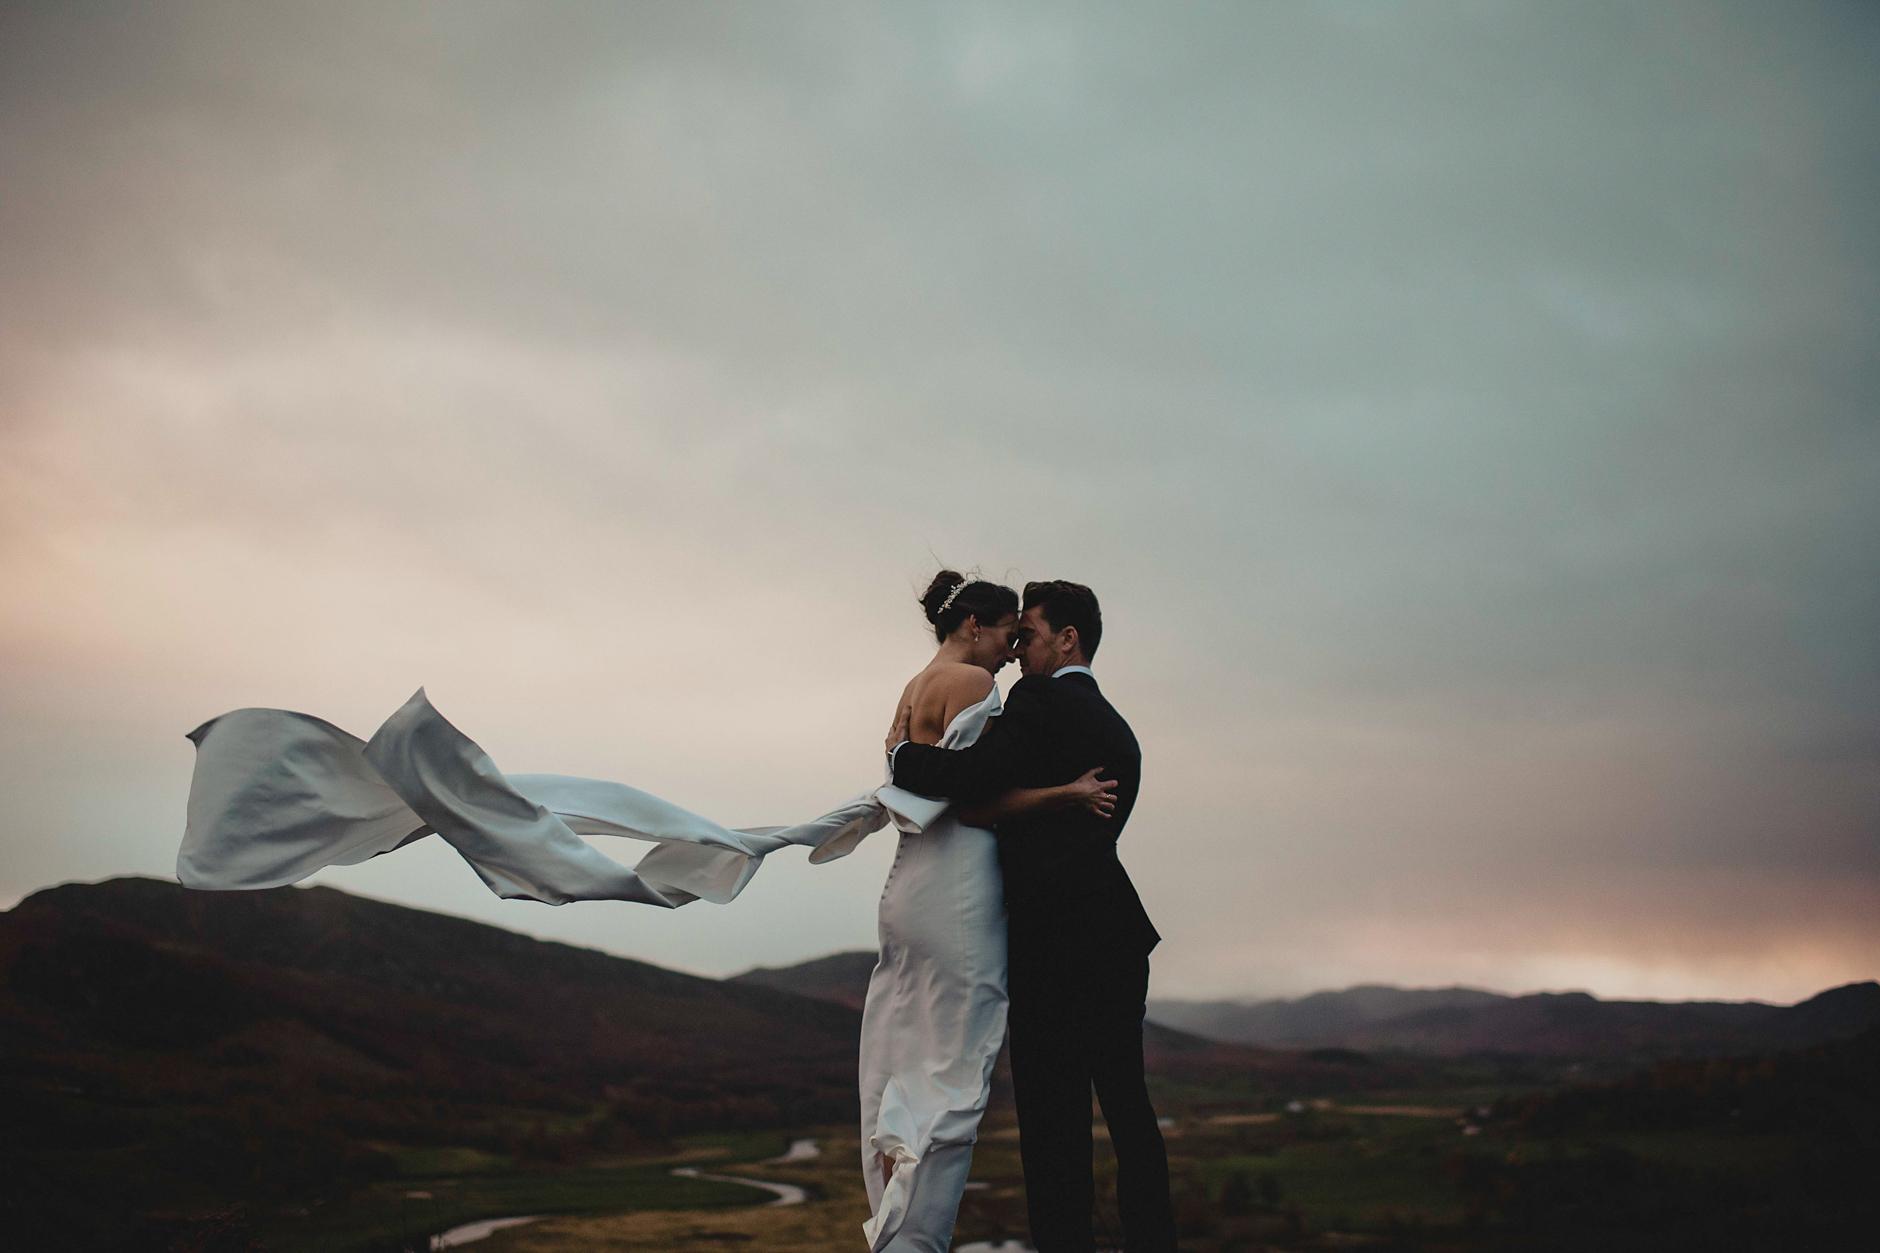 Glentruim-Wedding-Nikki-Leadbetter-Photography-144.jpg